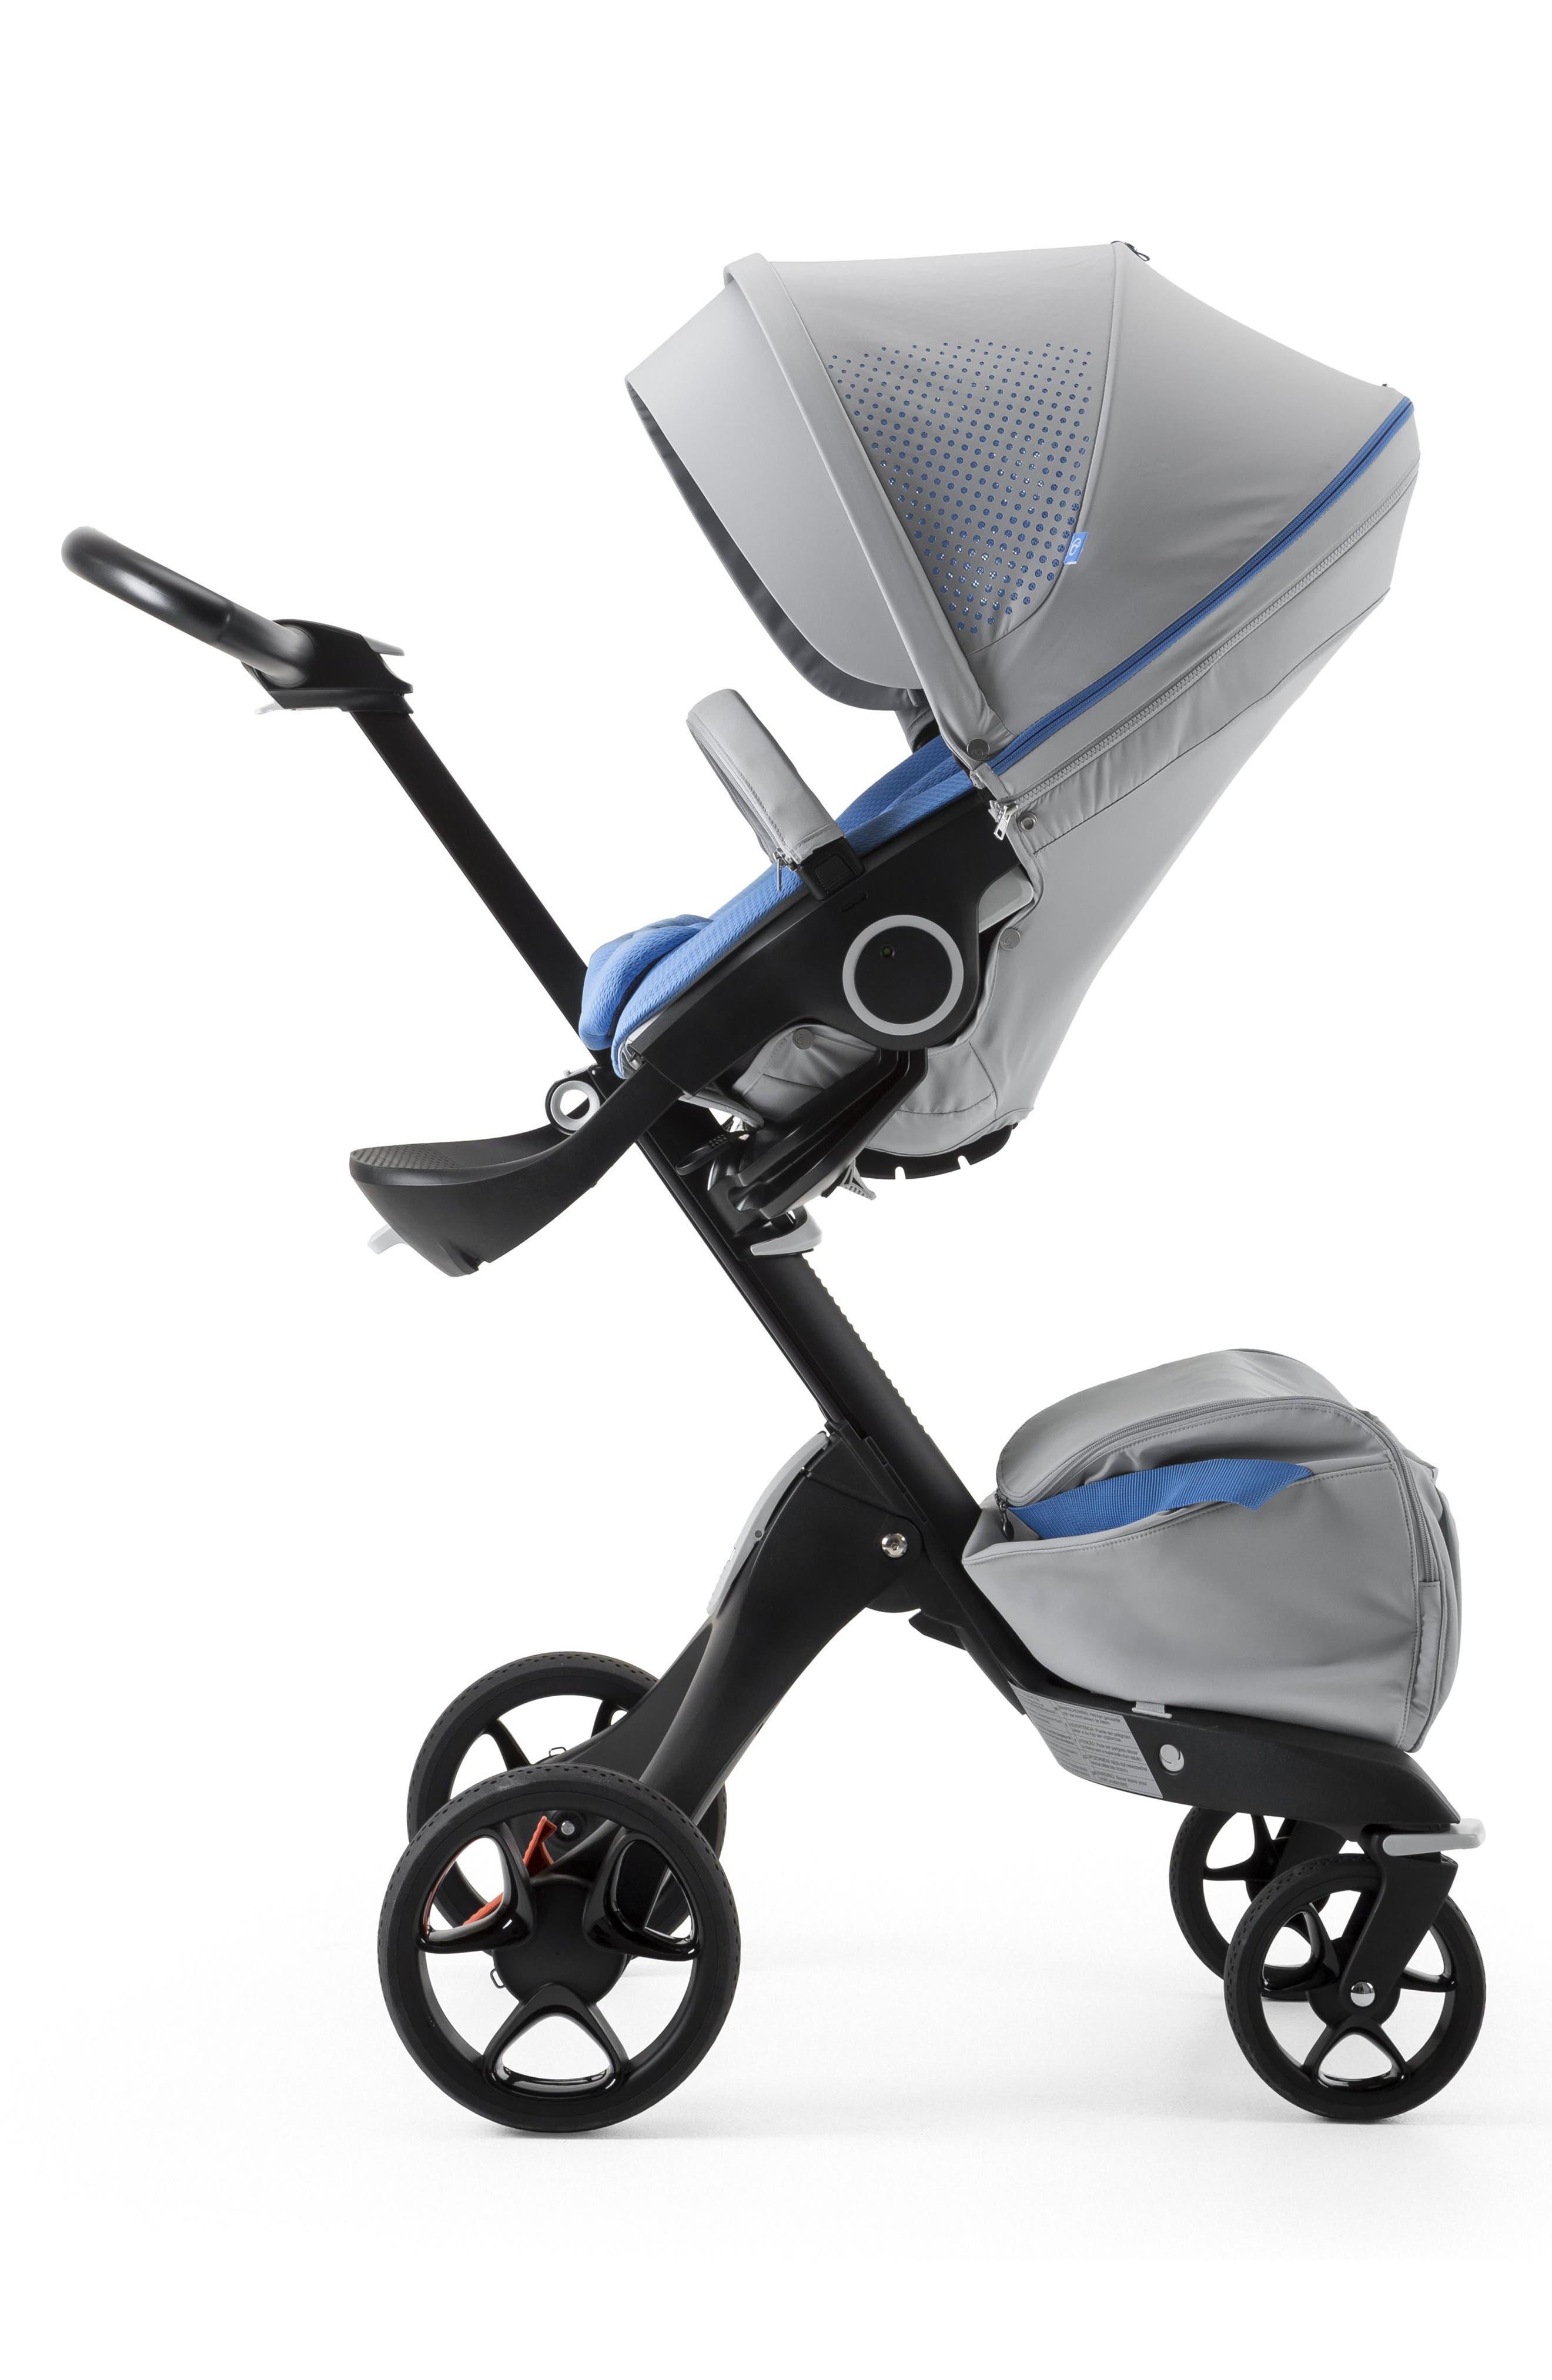 Alternate Image 1 Selected - Stokke Xplory® V5 Athleisure Stroller